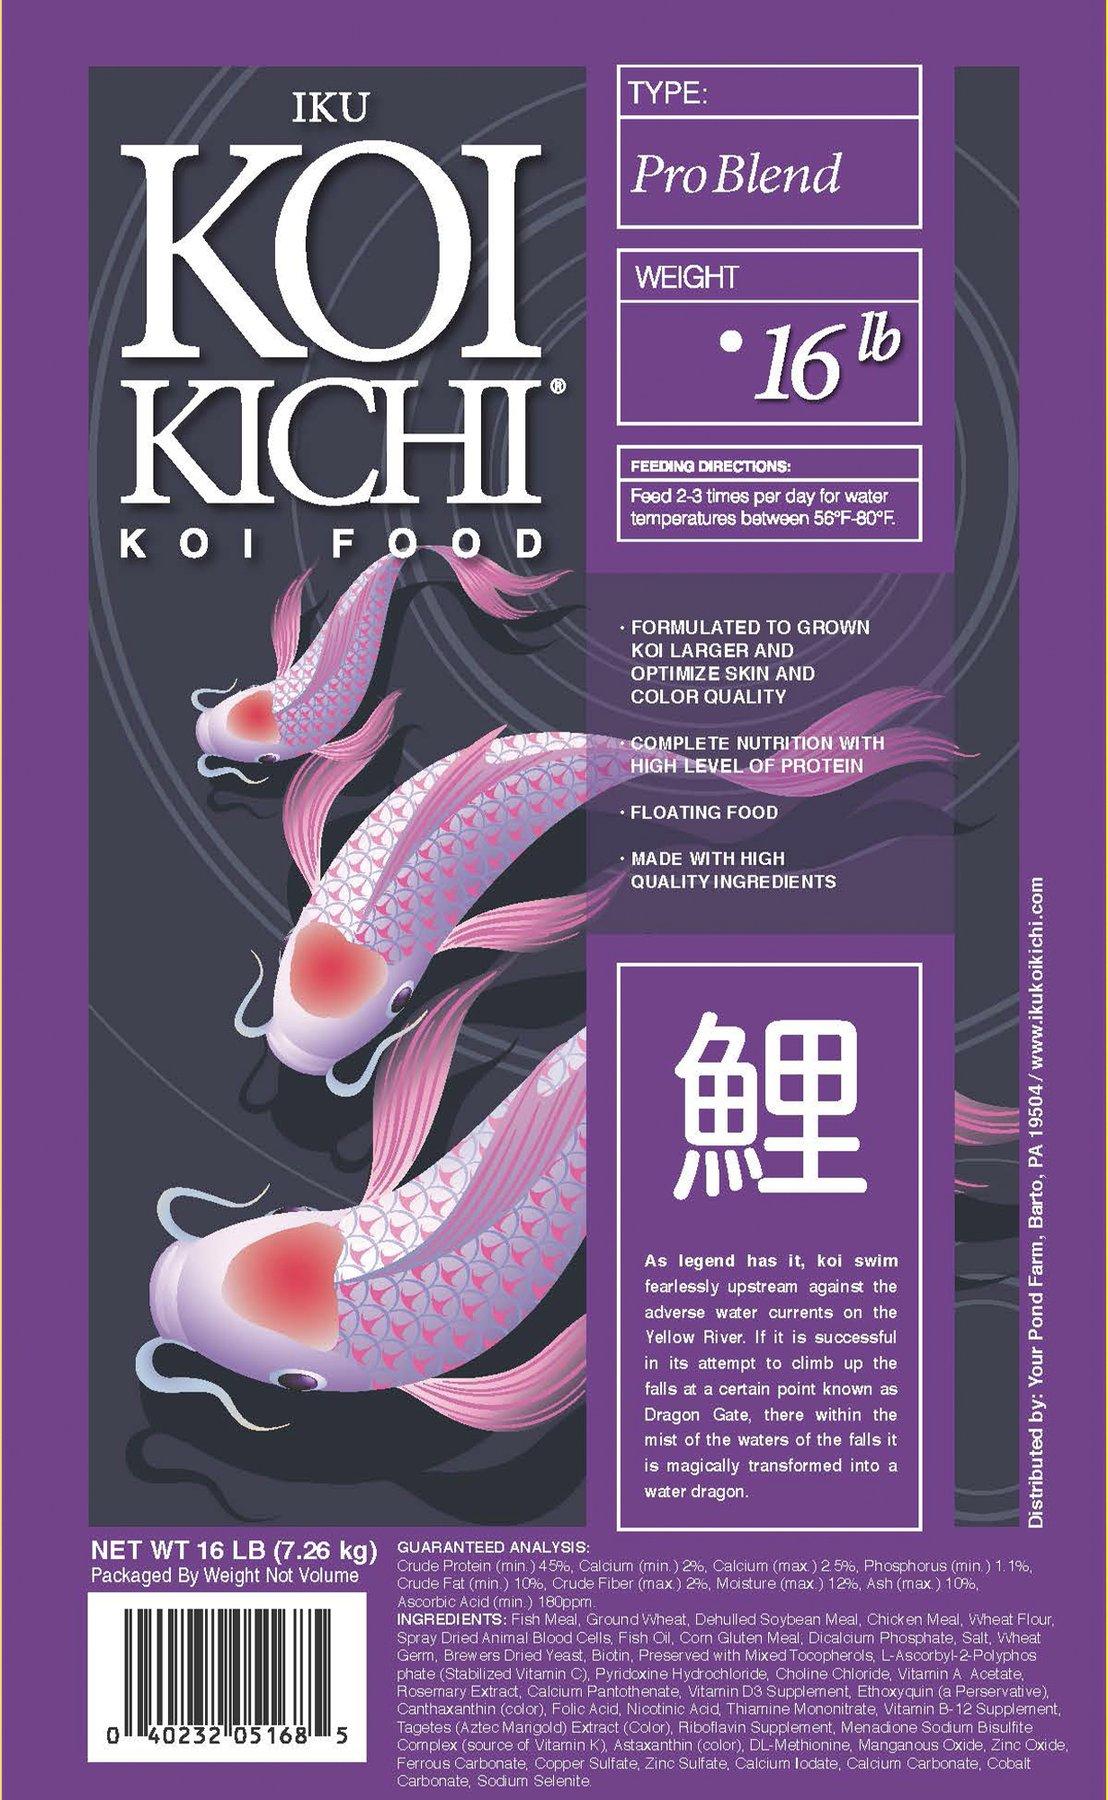 Iku Koi Kichi Pro Blend Koi Fish Food - 16 lbs. (Bucket)